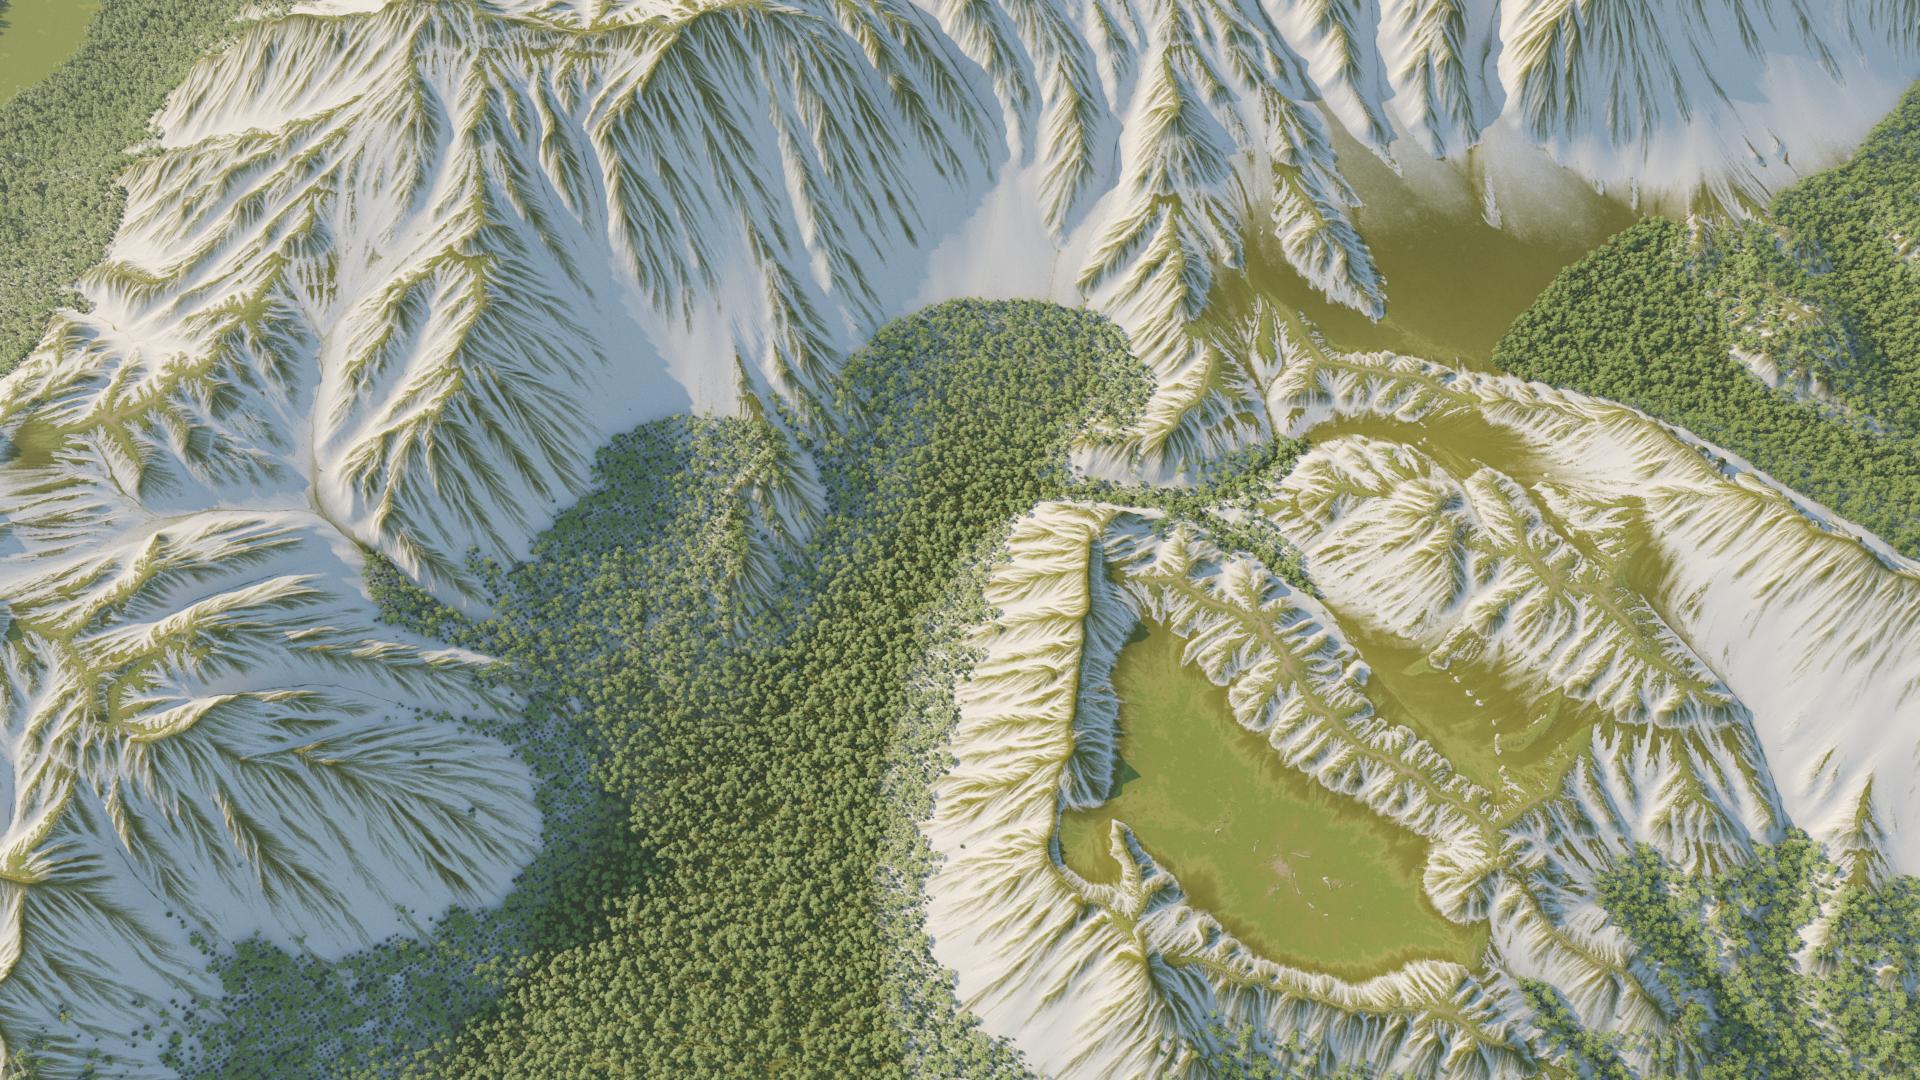 Jungle_MountainForest_06_